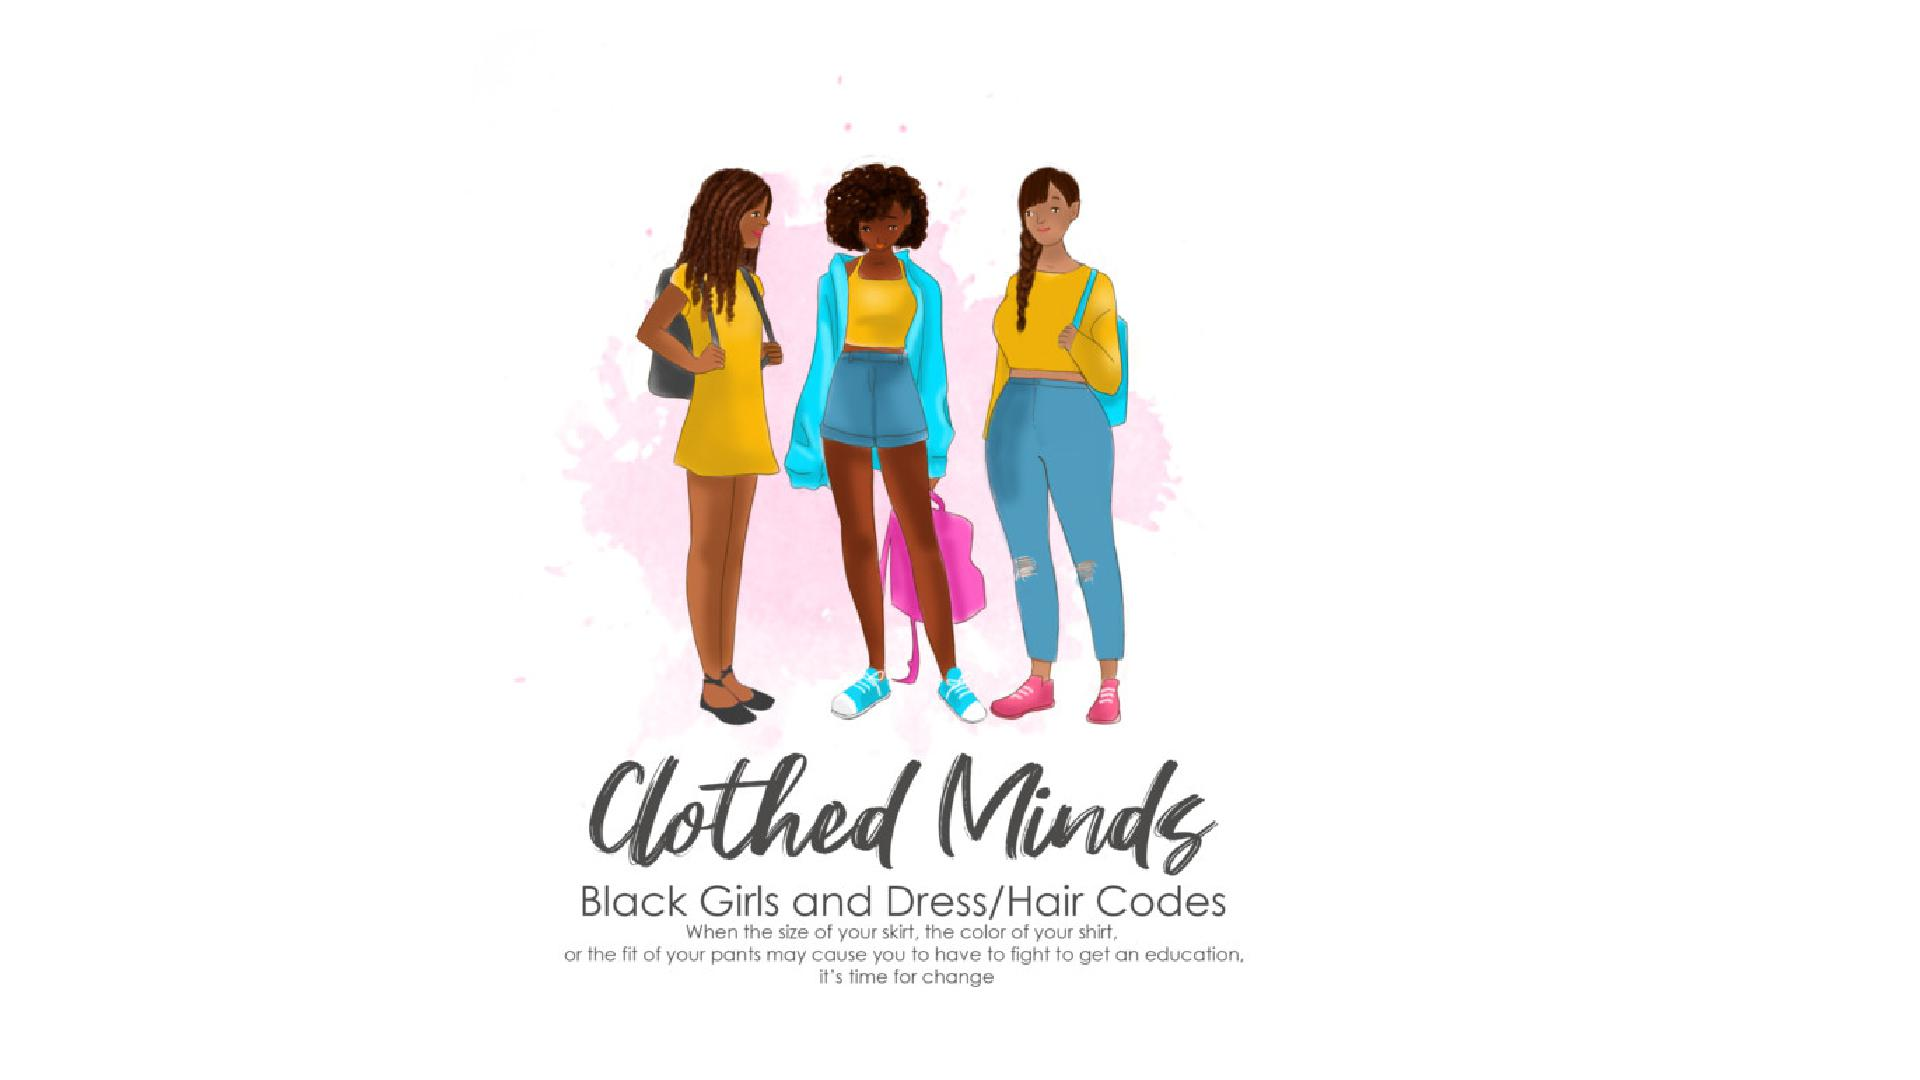 Clothed Minds